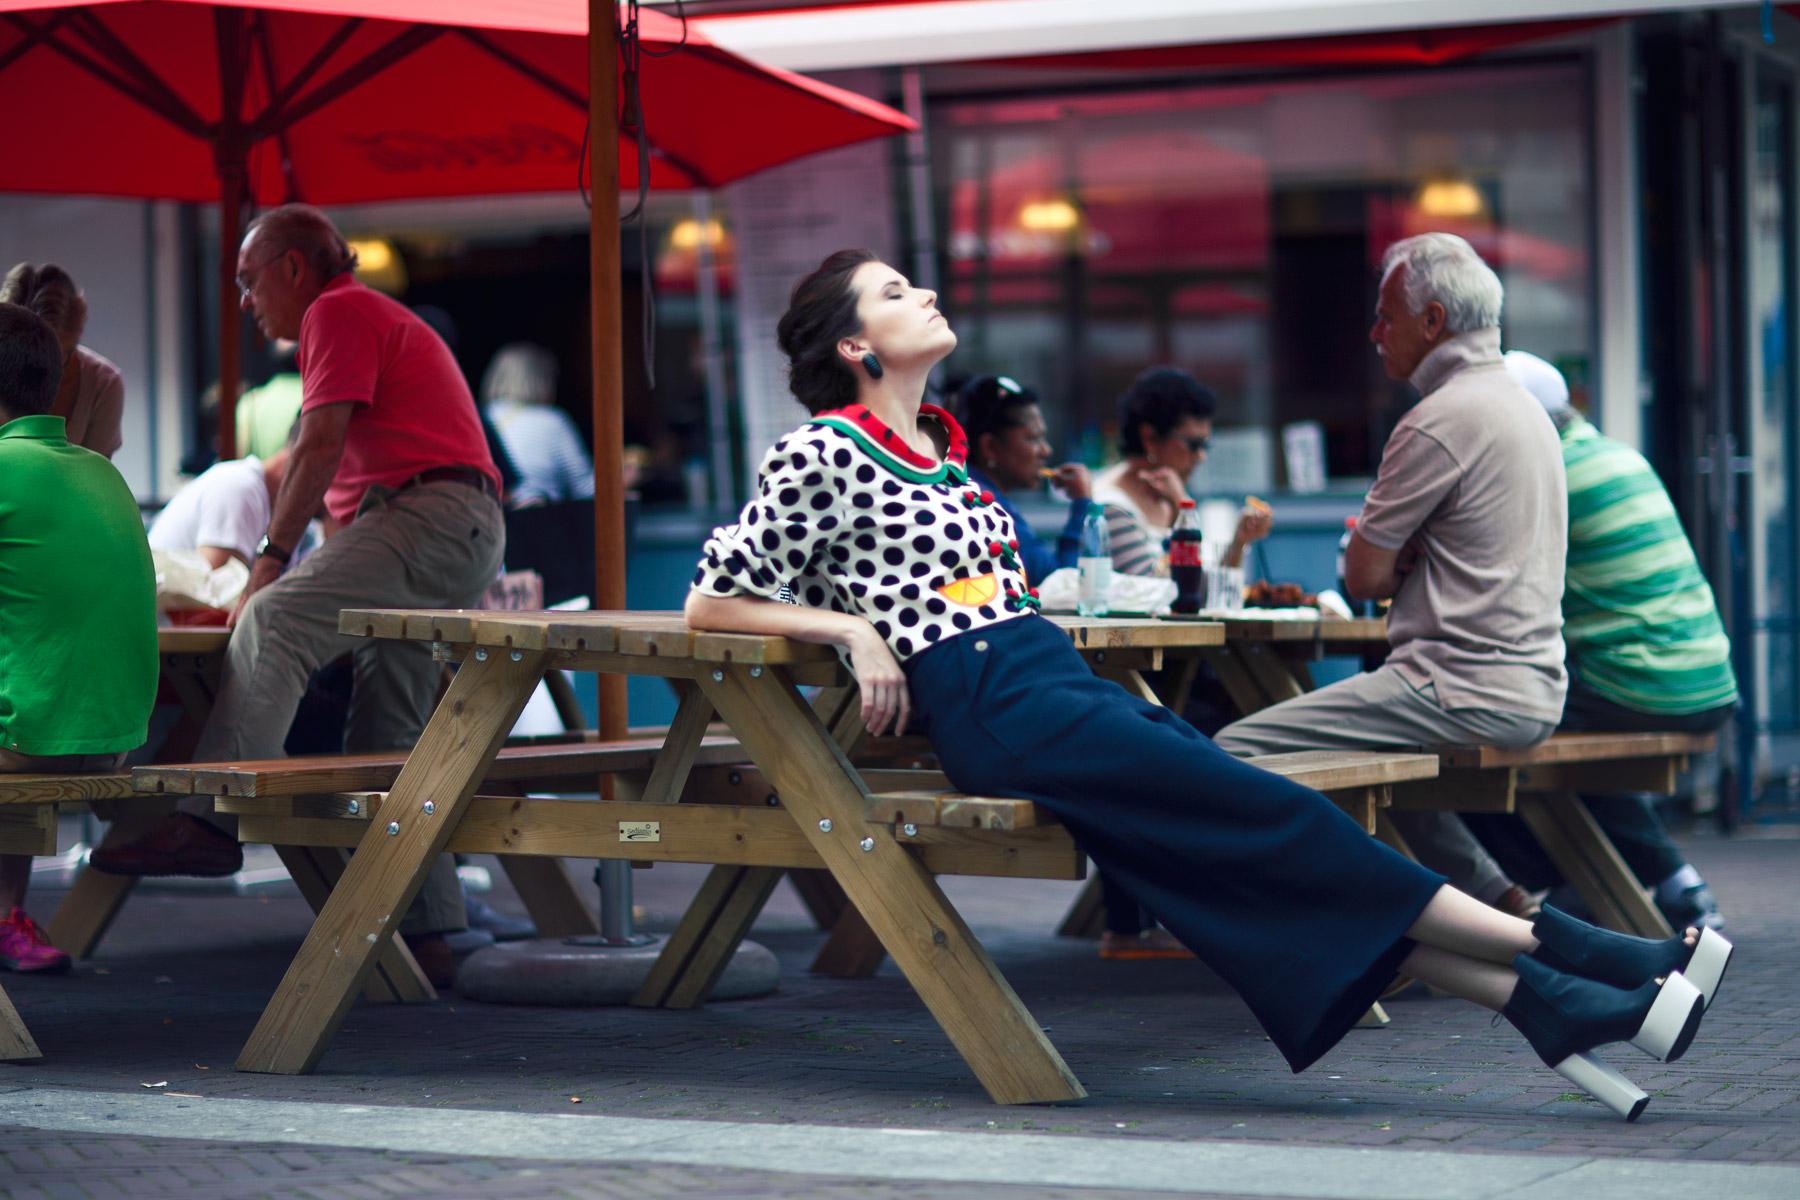 ananda-sebastian-moschino-marc-jacobs-vintage-eej-magazine-september-modemaand